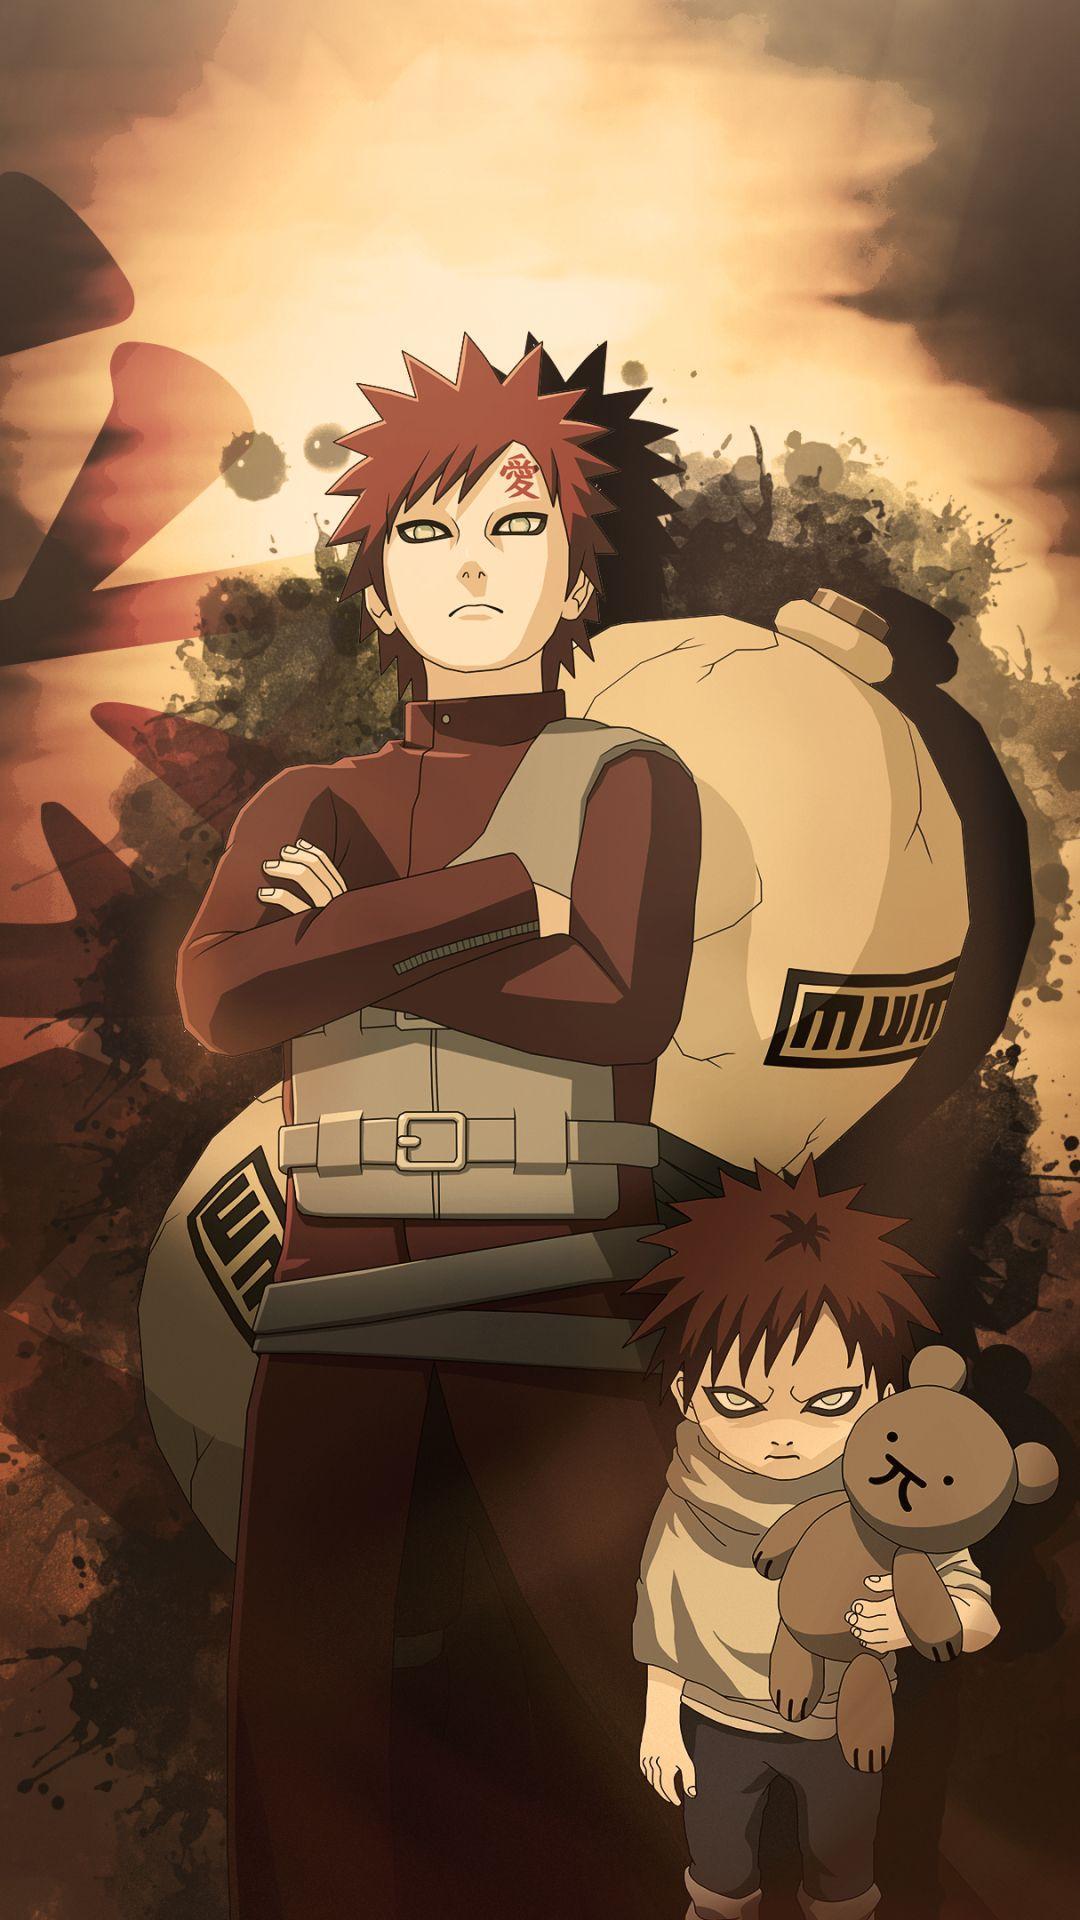 Gaara Naruto Wallpapers Top Free Gaara Naruto Backgrounds